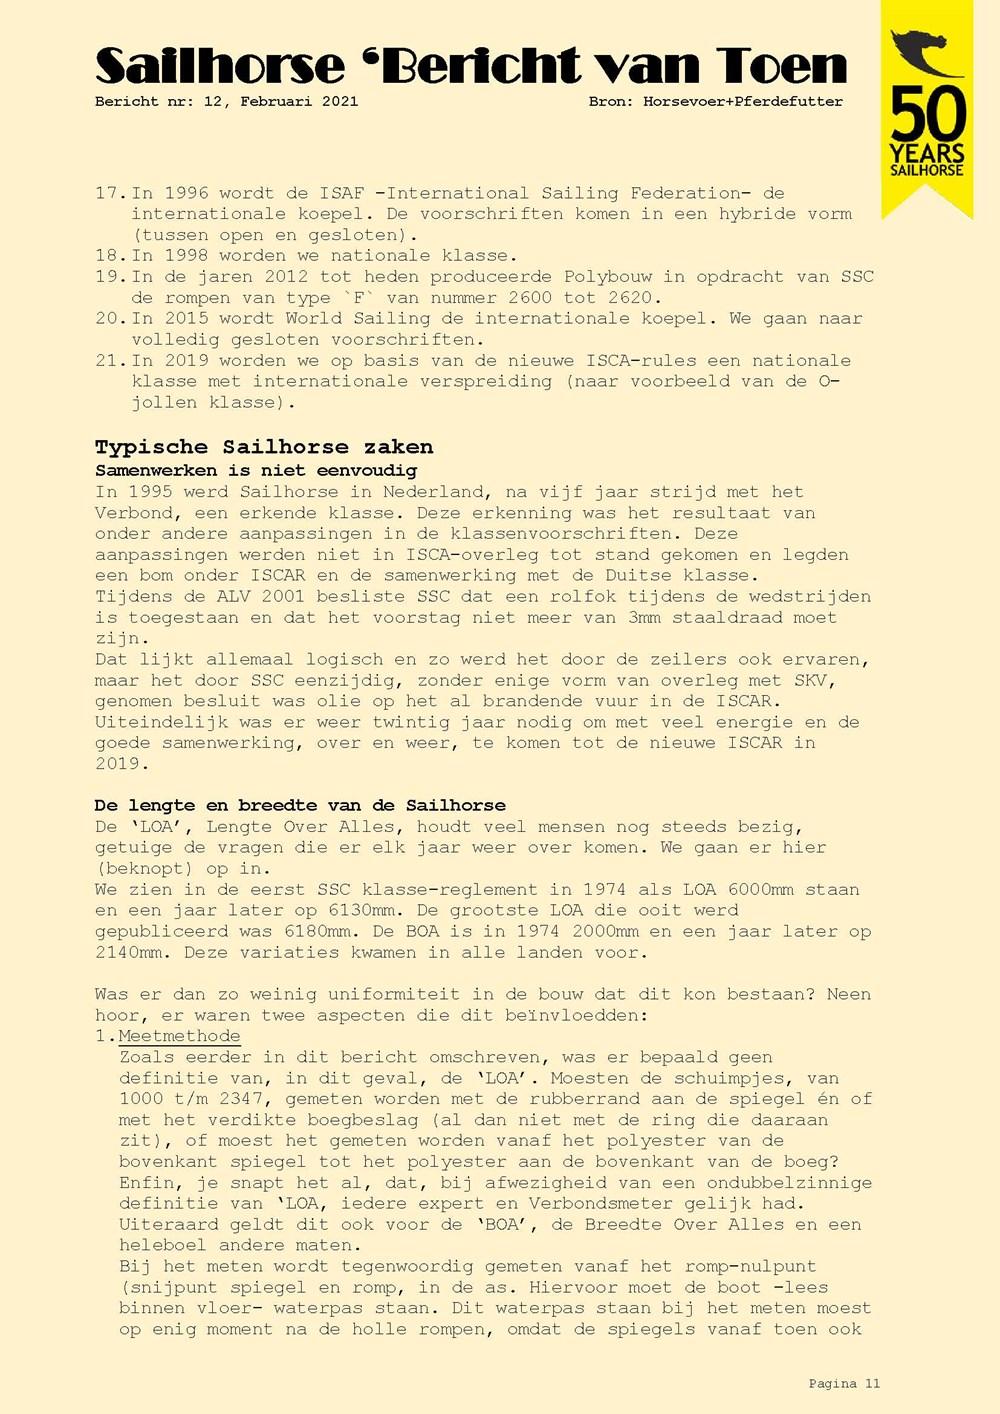 Bvt12_Page_11.jpg